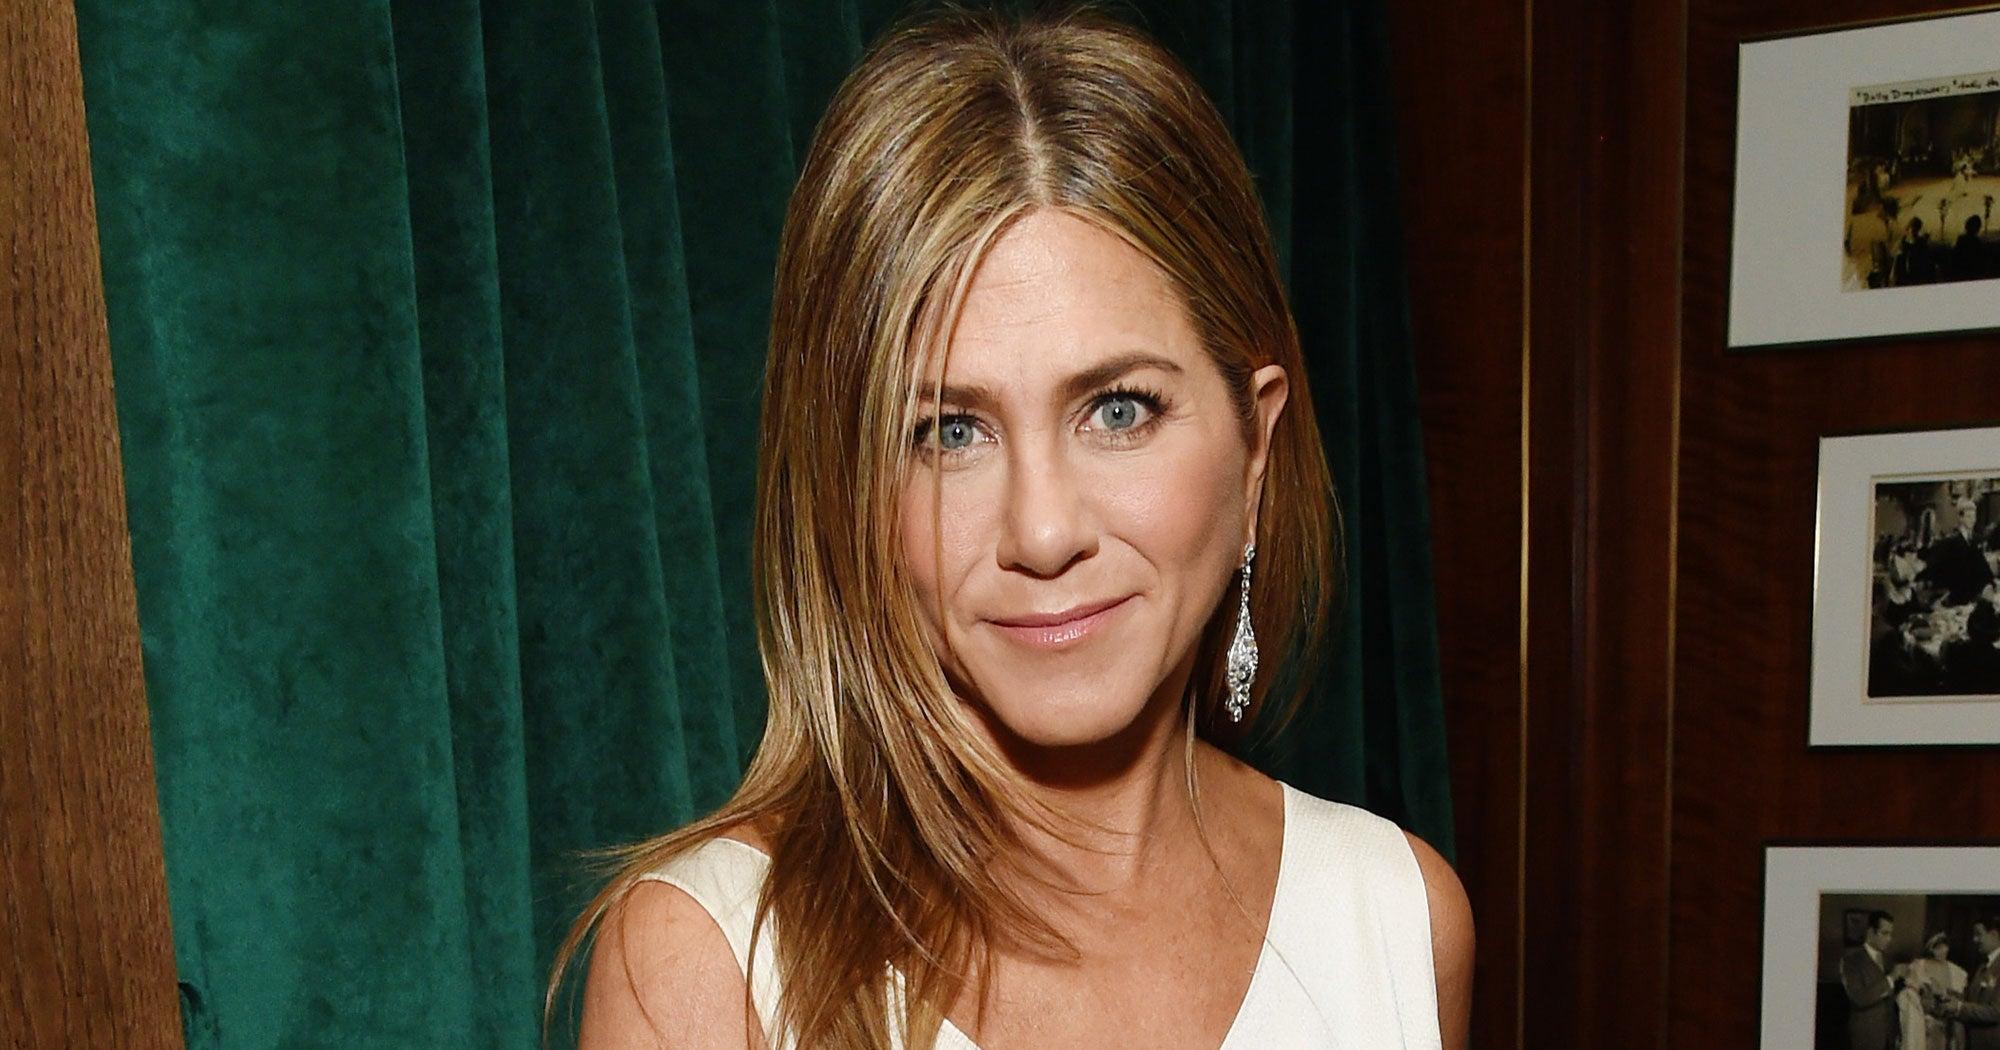 Jennifer Aniston Shopped Her Closet For That Glamorous White Dior SAG Awards Gown